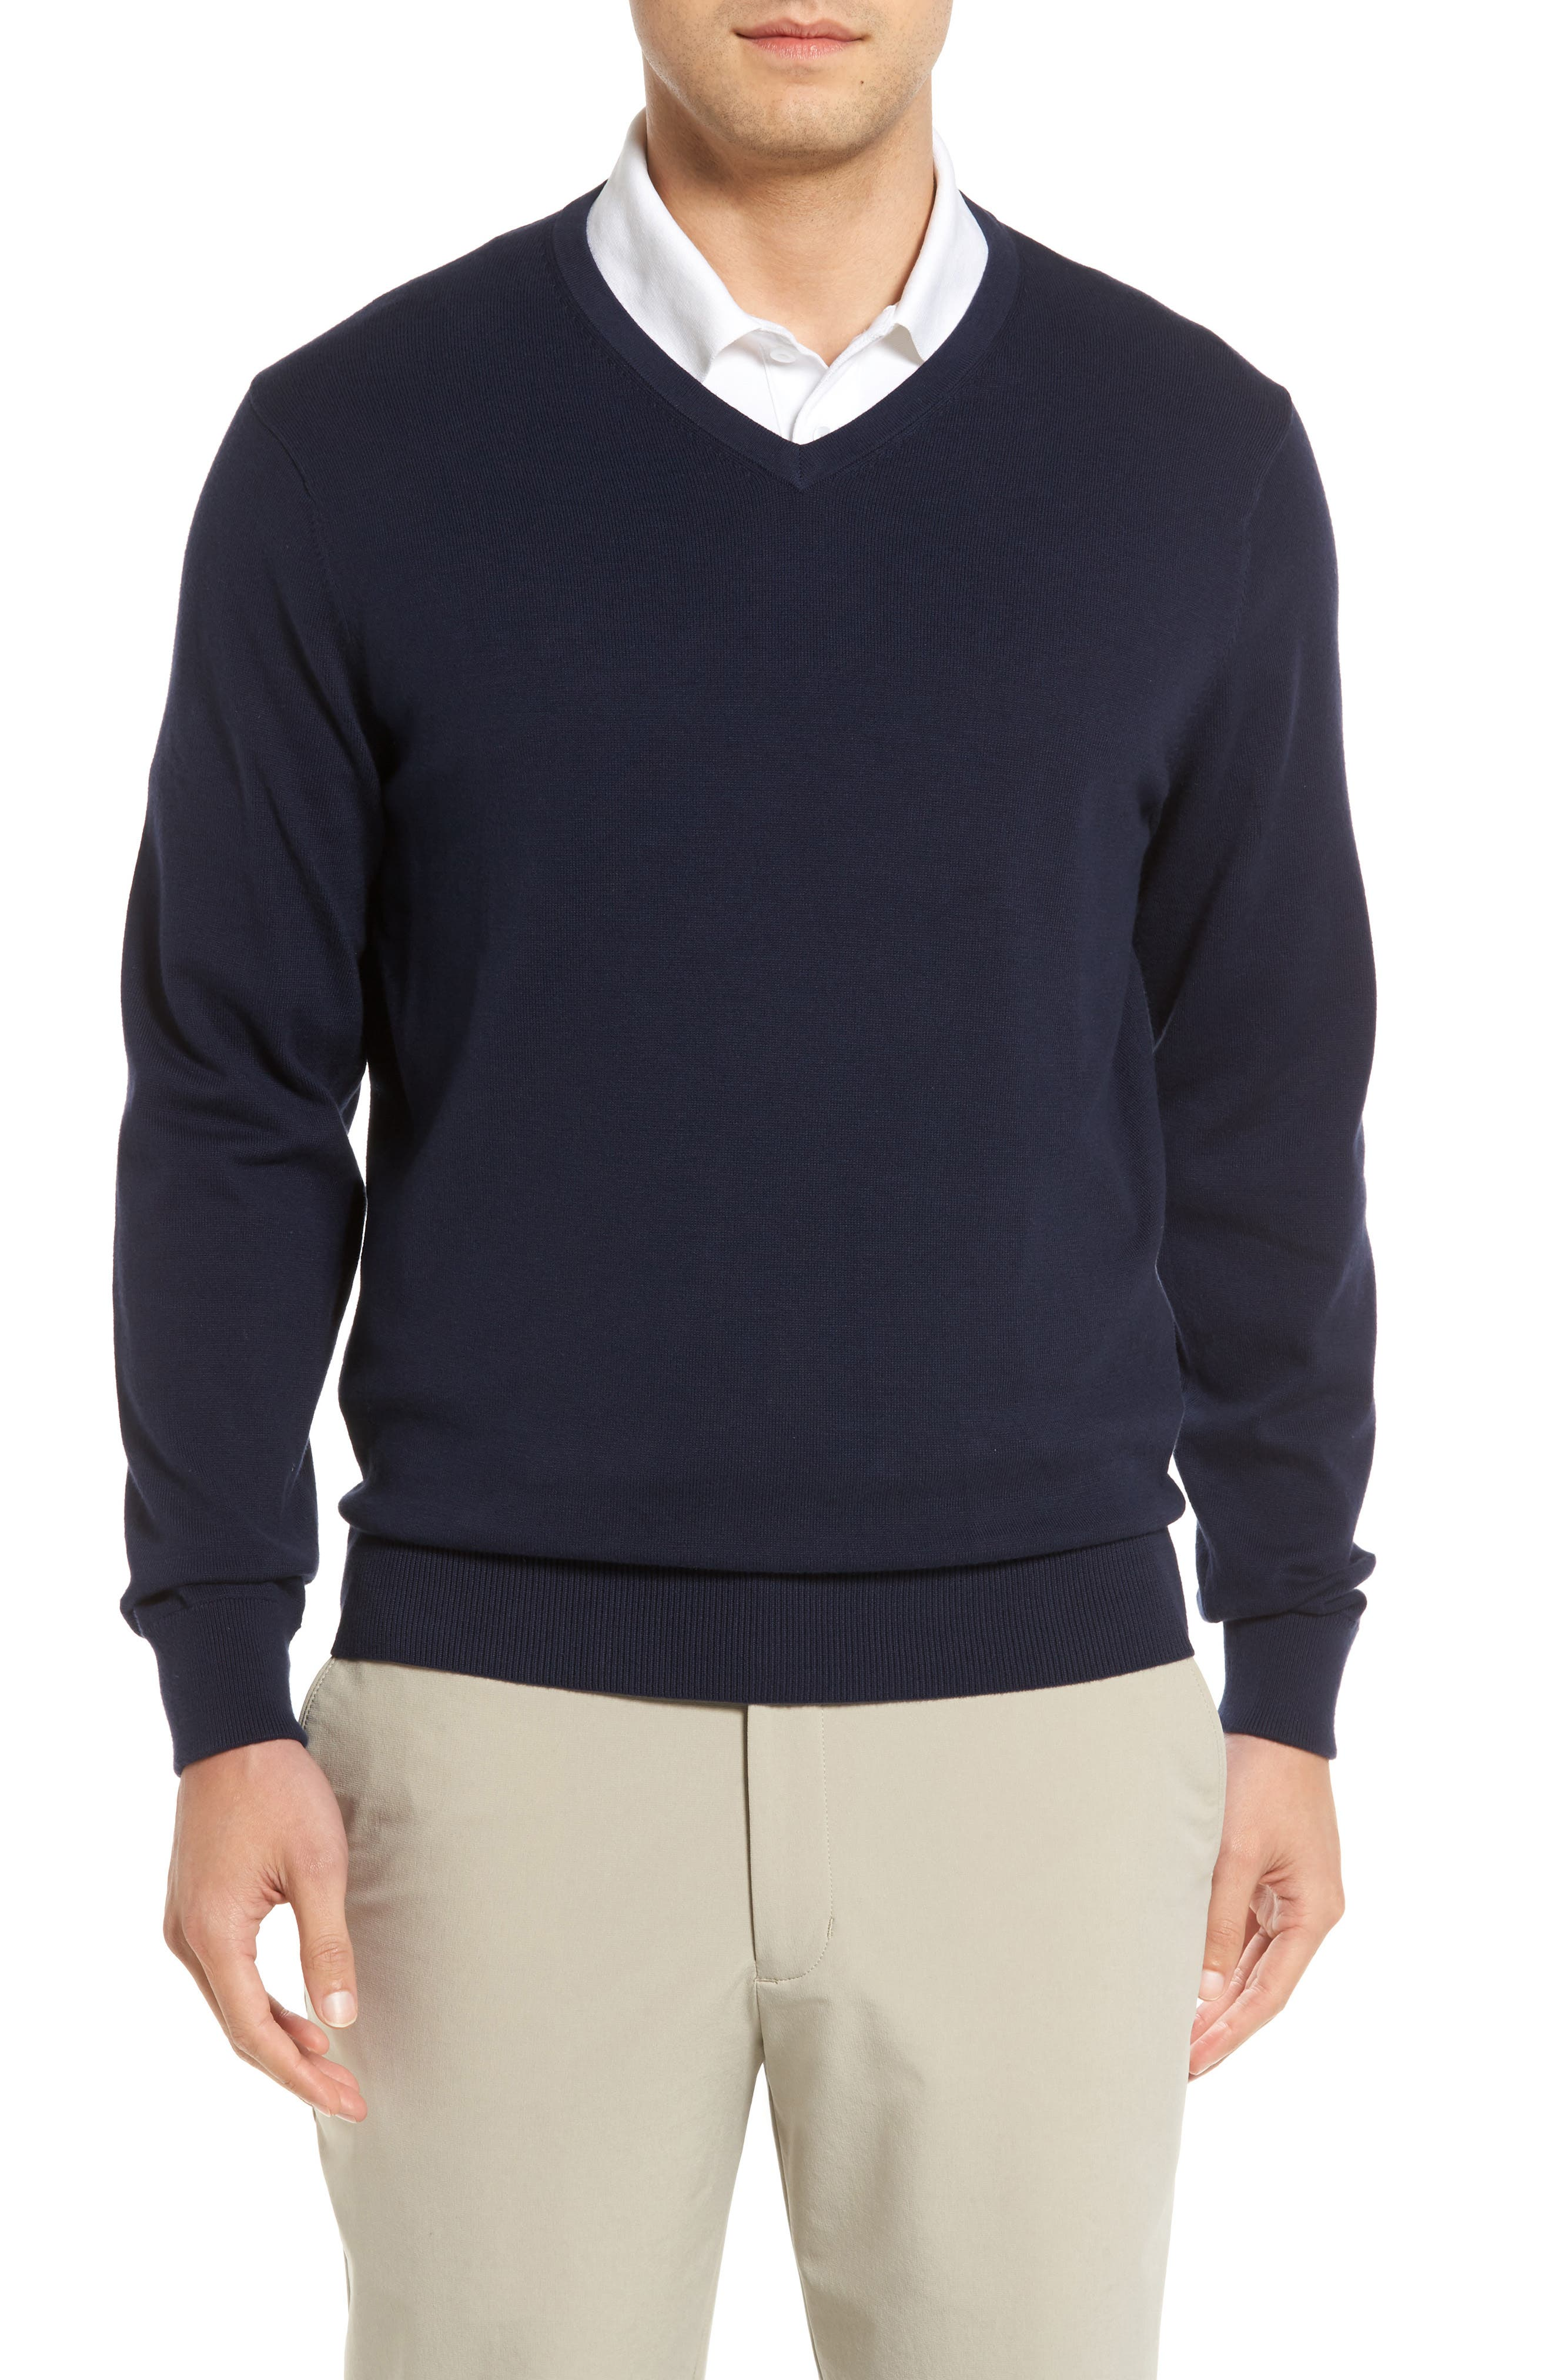 Alternate Image 1 Selected - Cutter & Buck Lakemont V-Neck Sweater